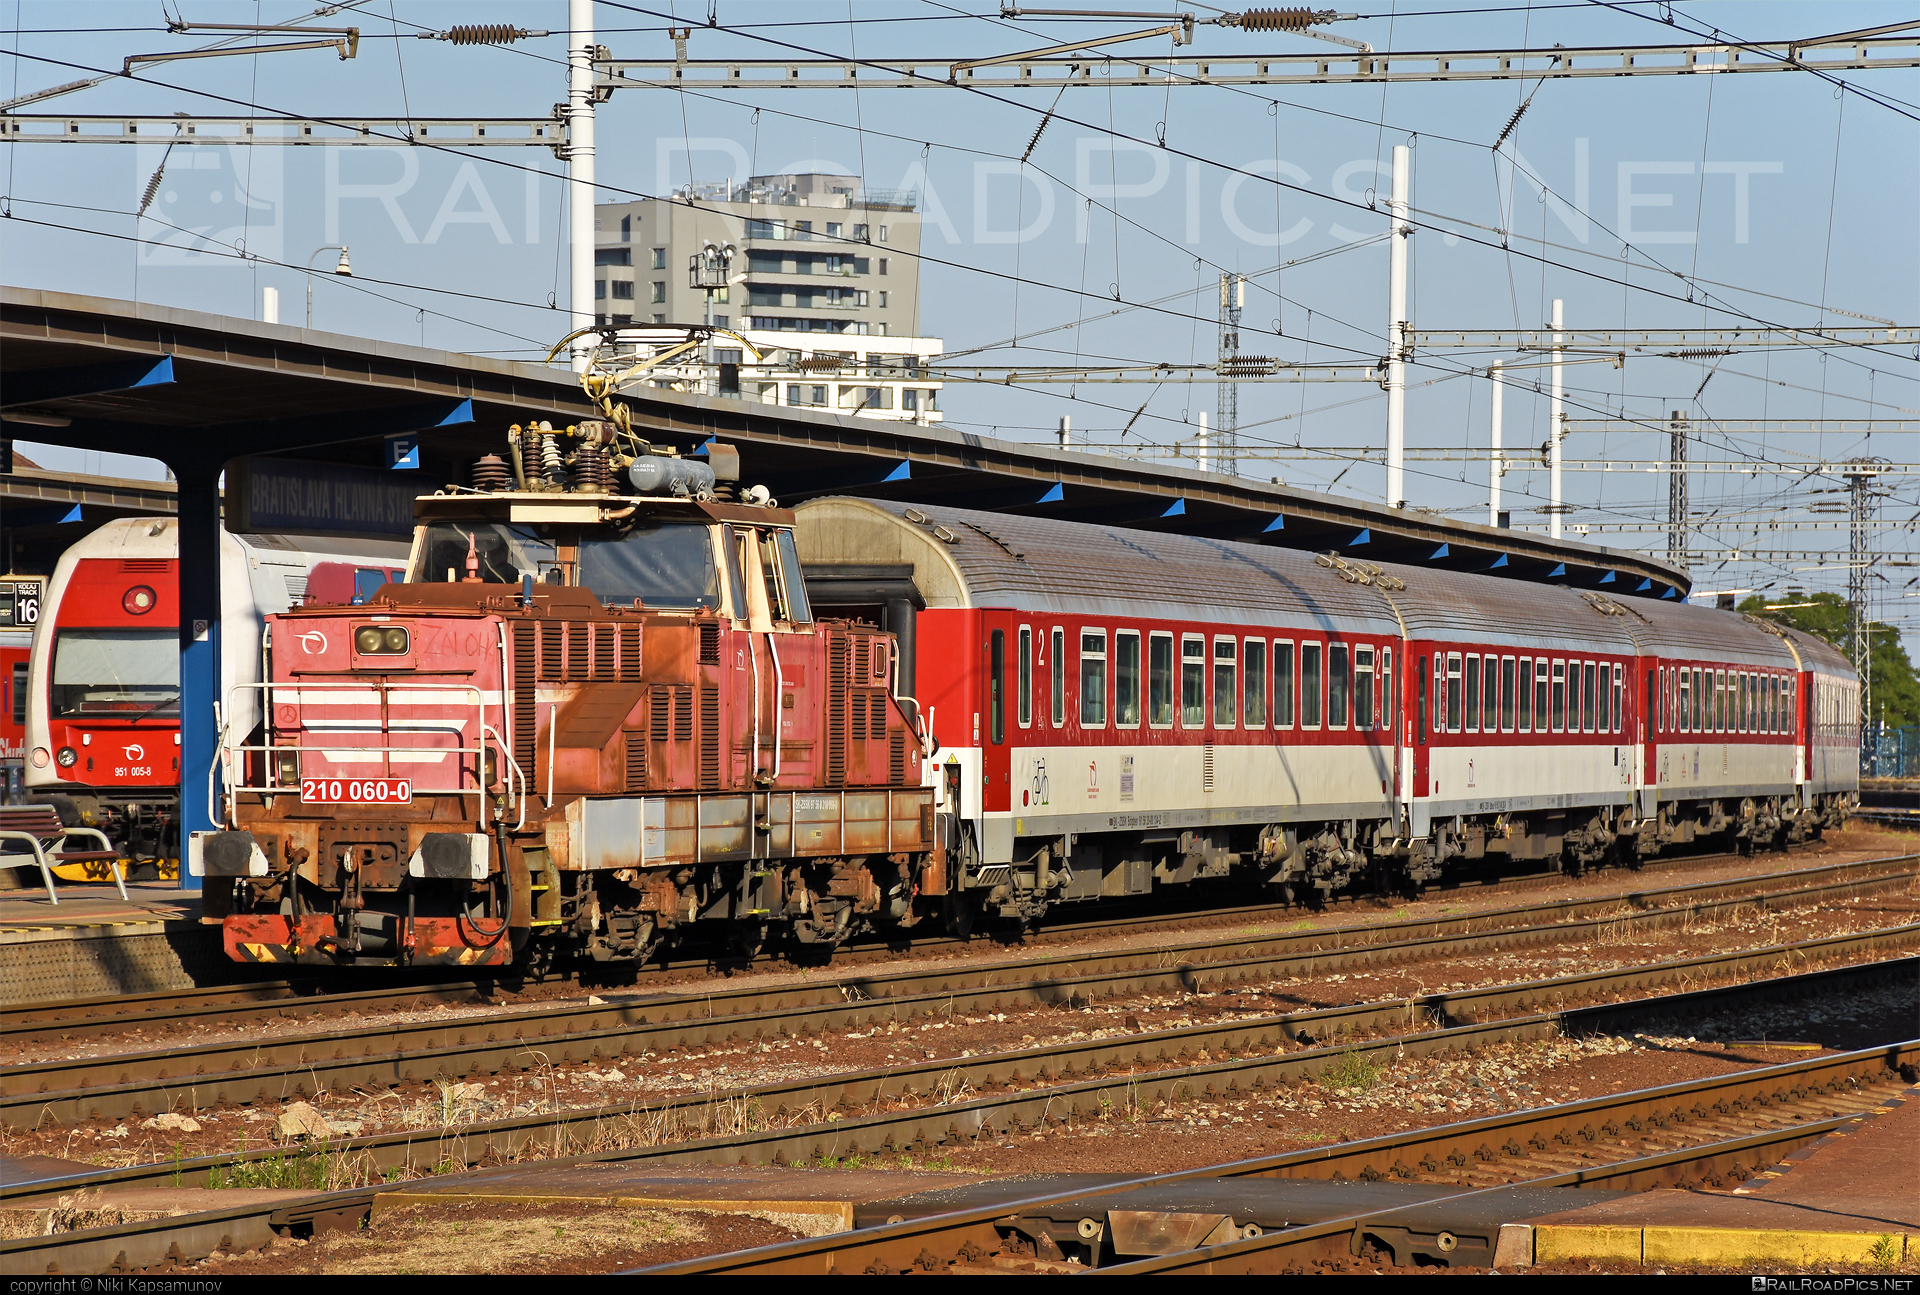 Škoda 51E - 210 060-0 operated by Železničná Spoločnost' Slovensko, a.s. #ZeleznicnaSpolocnostSlovensko #locomotive210 #skoda #skoda51e #zehlicka #zssk